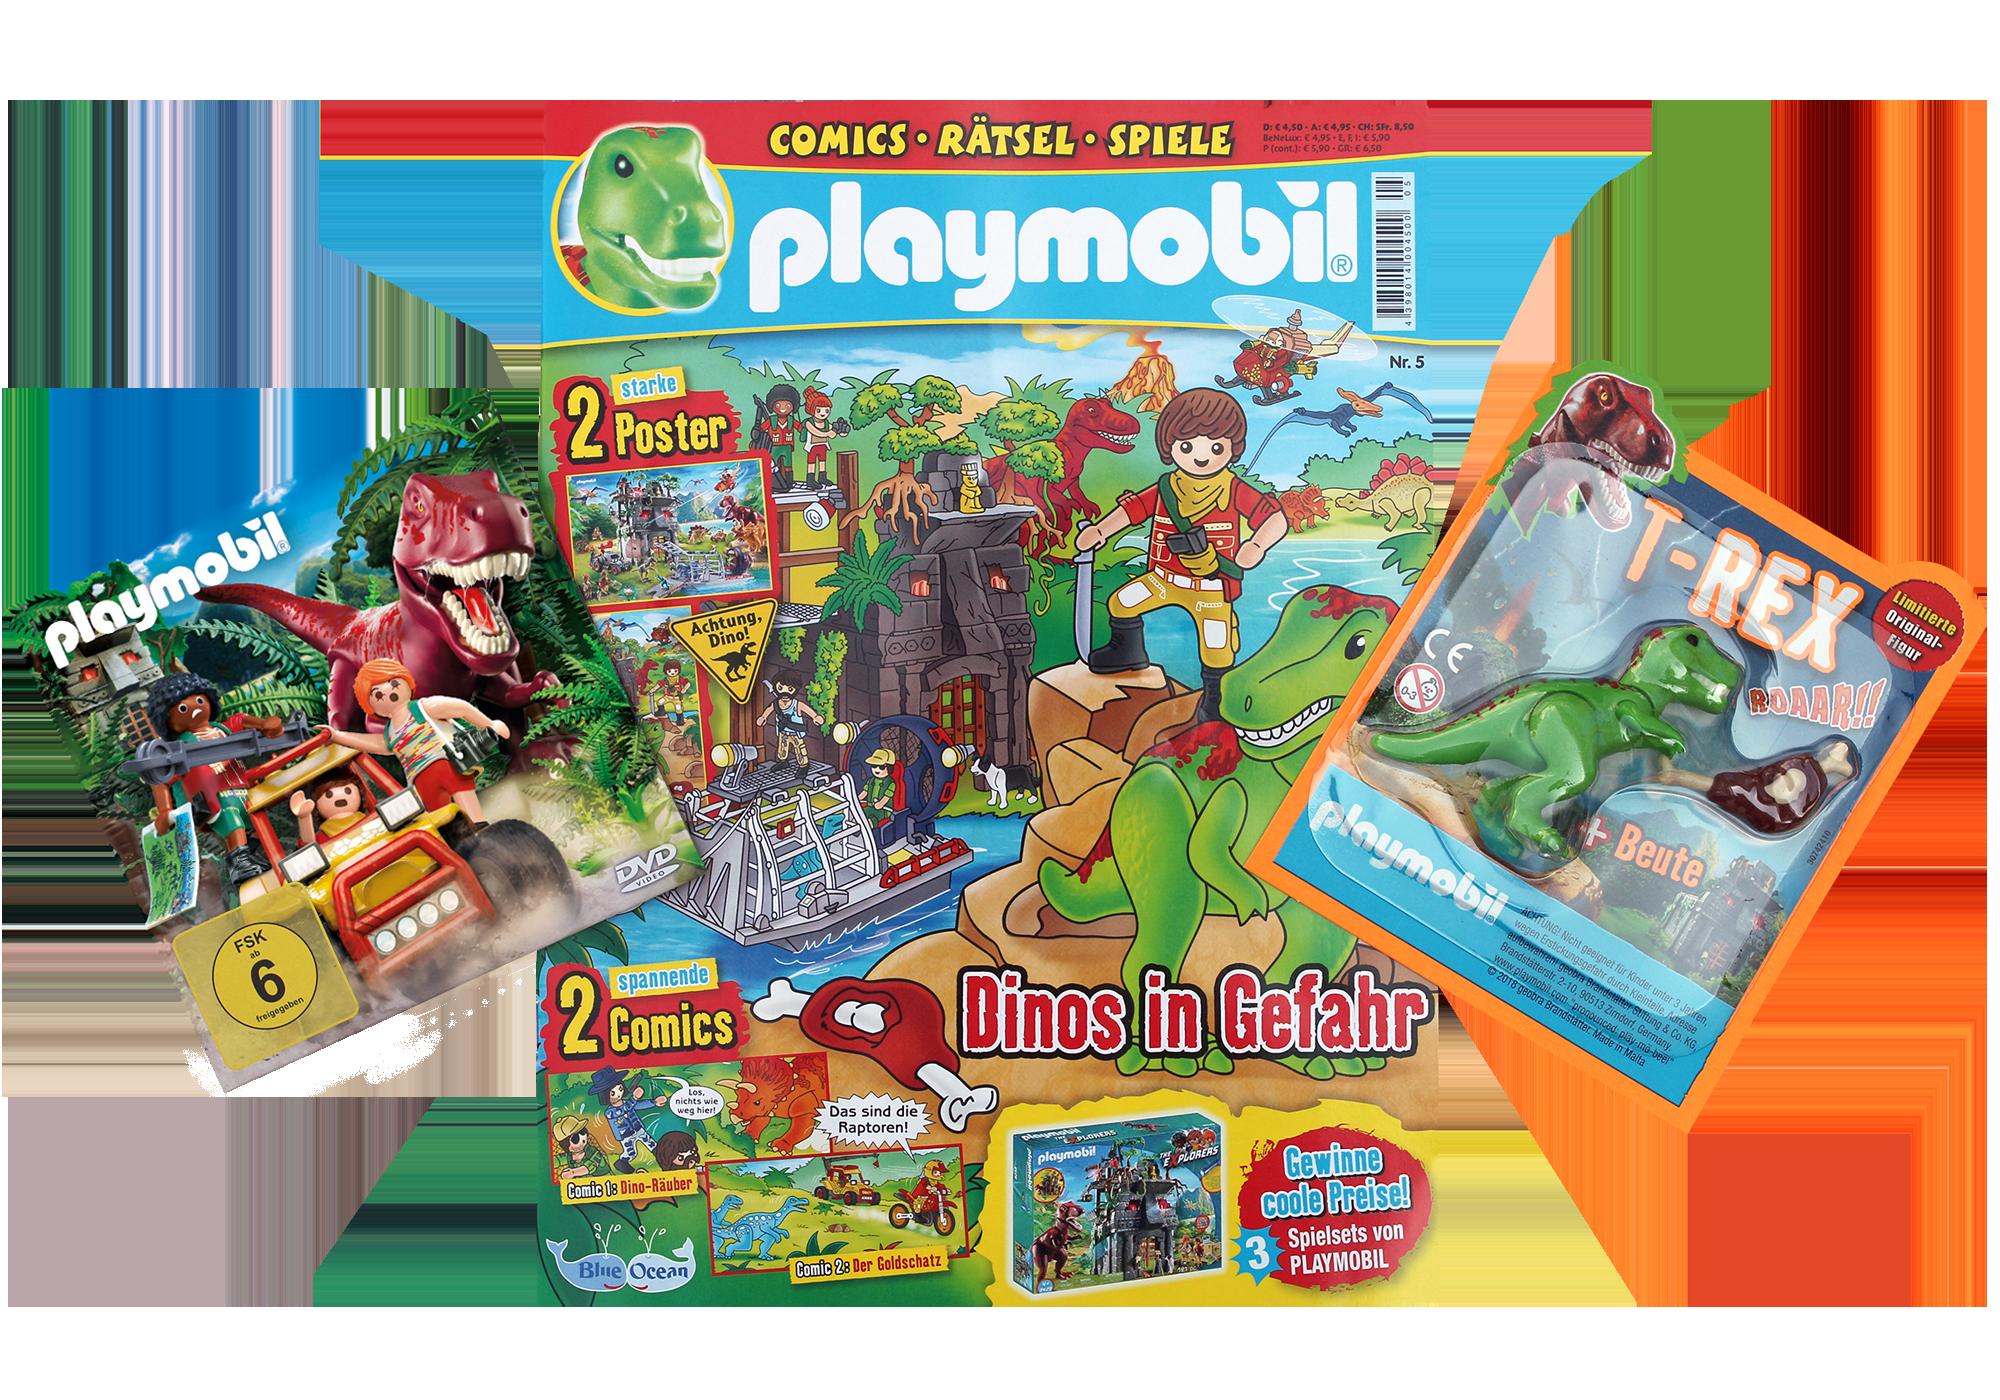 http://media.playmobil.com/i/playmobil/80607_product_detail/PLAYMOBIL-Magazin 5/2018 (Heft 62)